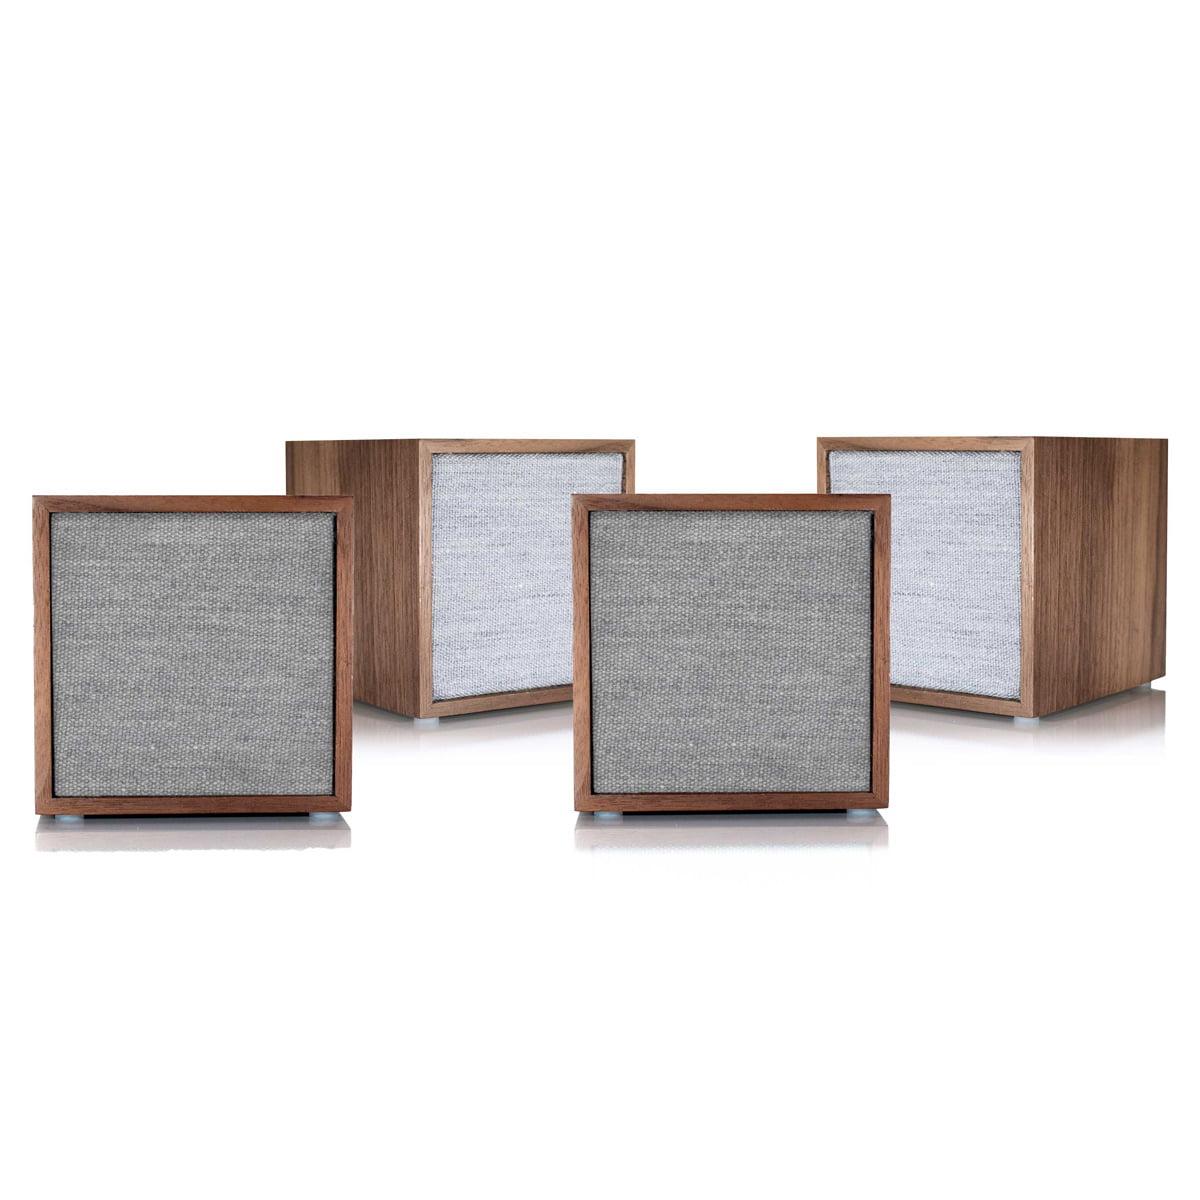 Tivoli Audio CUBE Wireless Speakers Set of 4 by Tivoli Audio